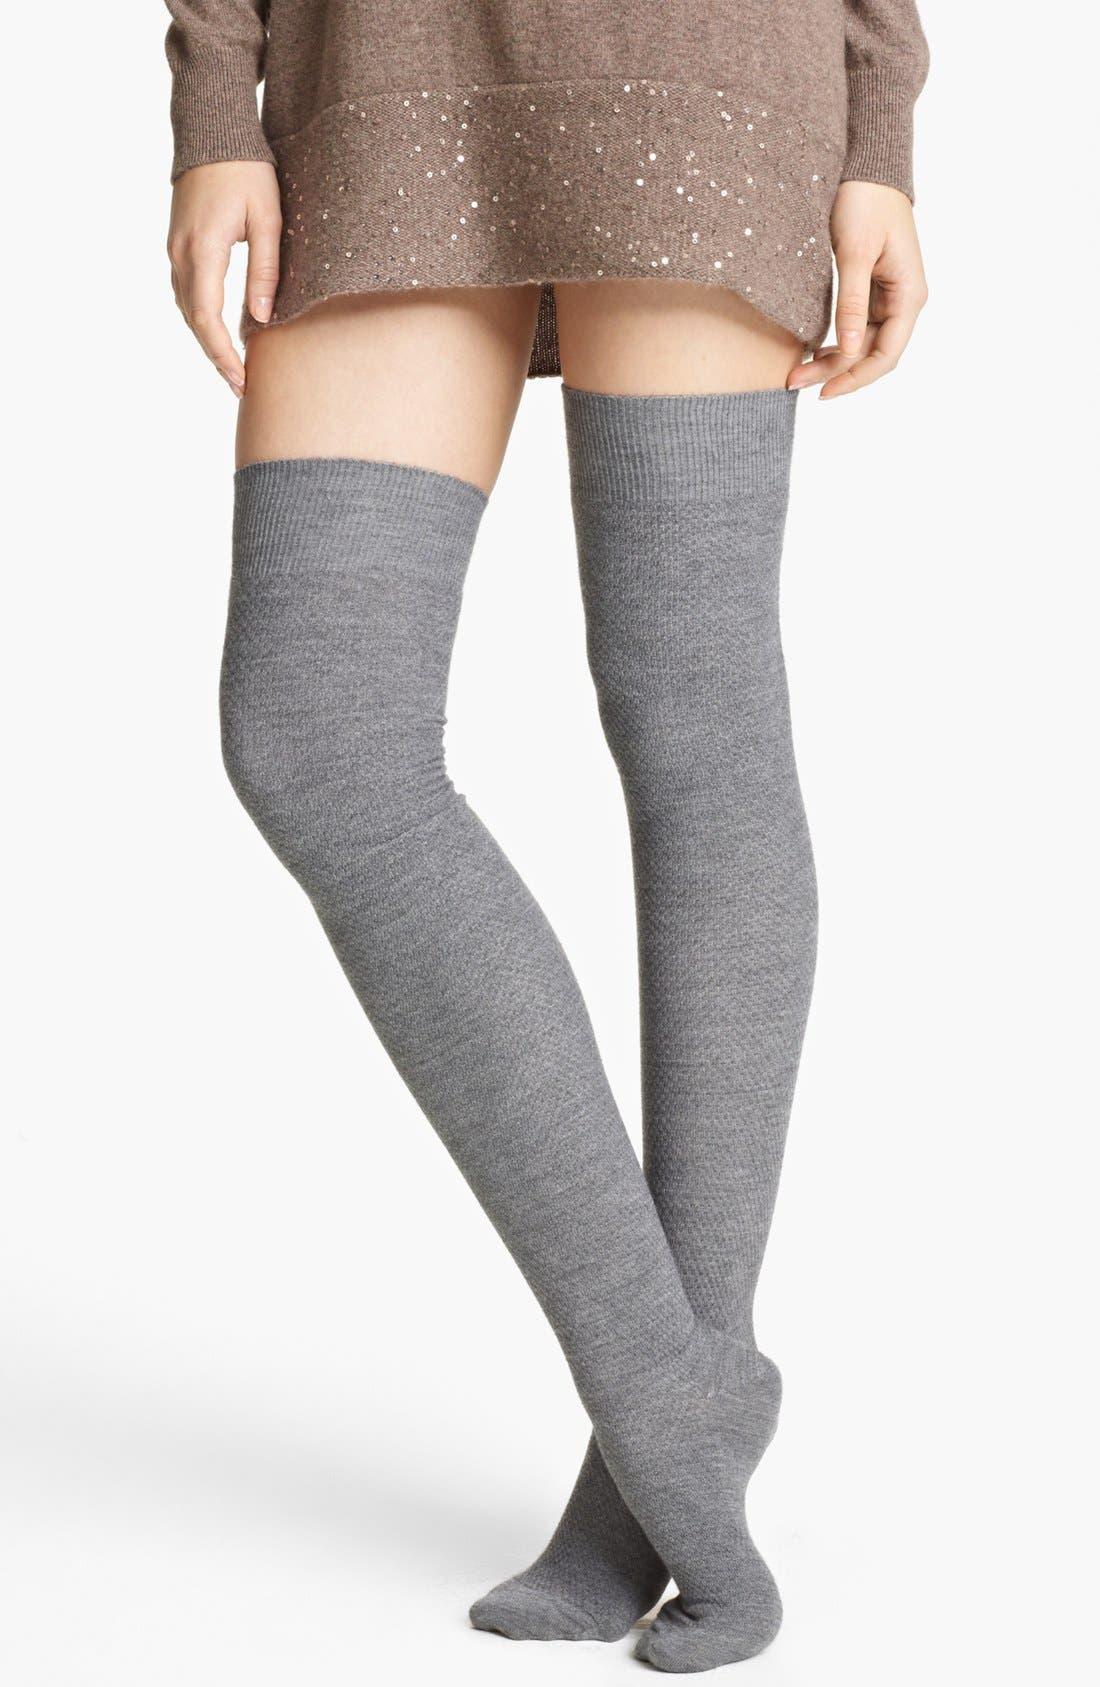 Alternate Image 1 Selected - Fabiana Filippi Thigh High Waffle Knit Tights